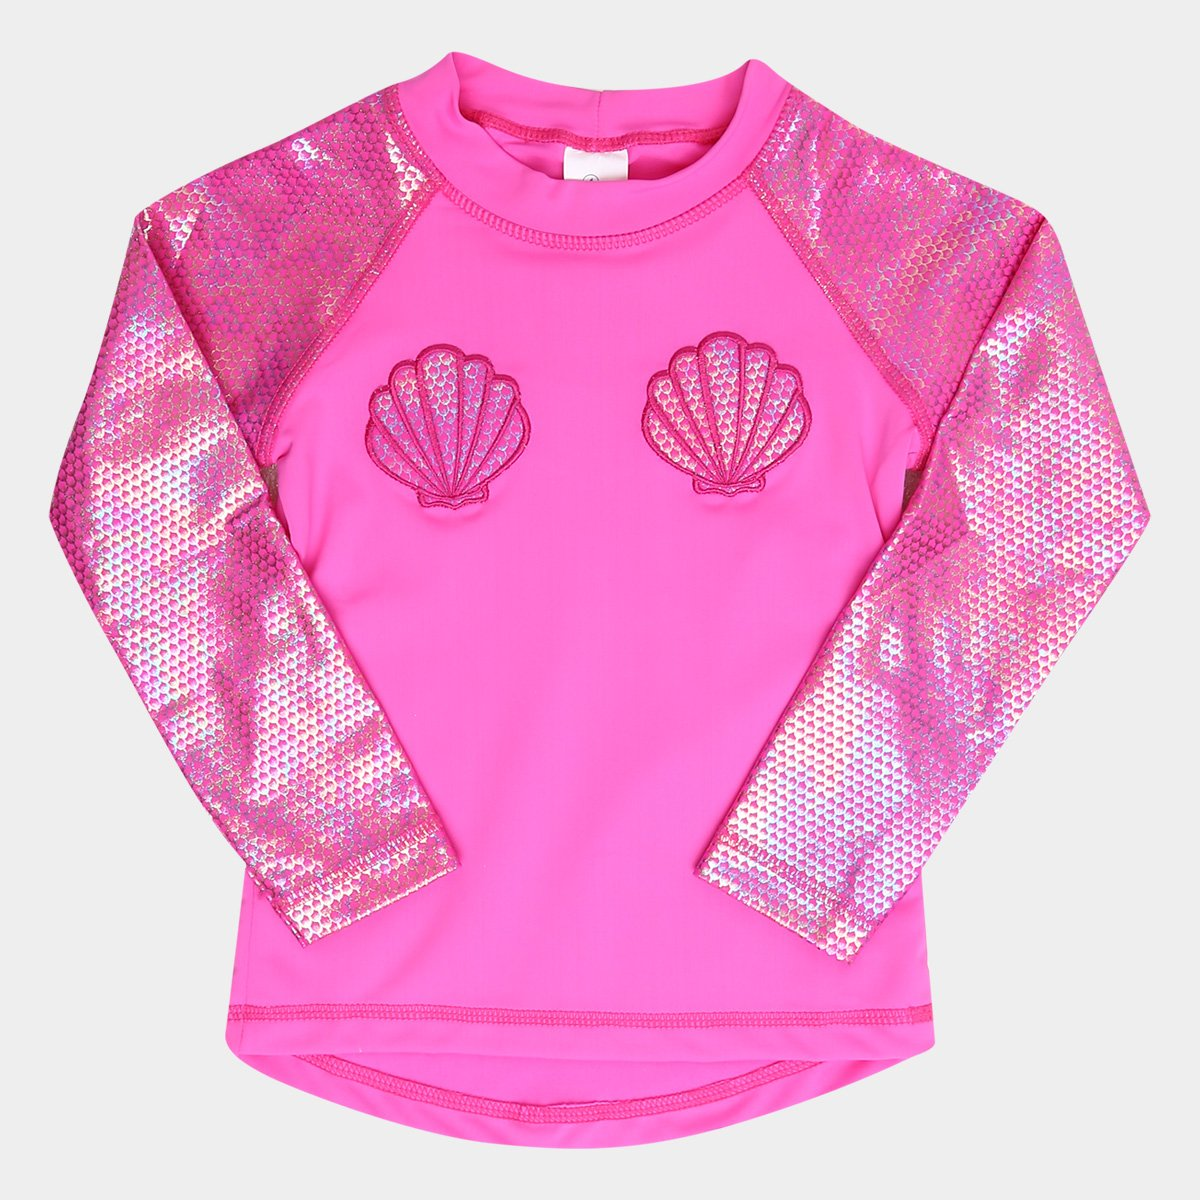 f00f0d5304 Camiseta Infantil Tip Top Moda Praia Sereia FPS+50 Feminina - Pink ...